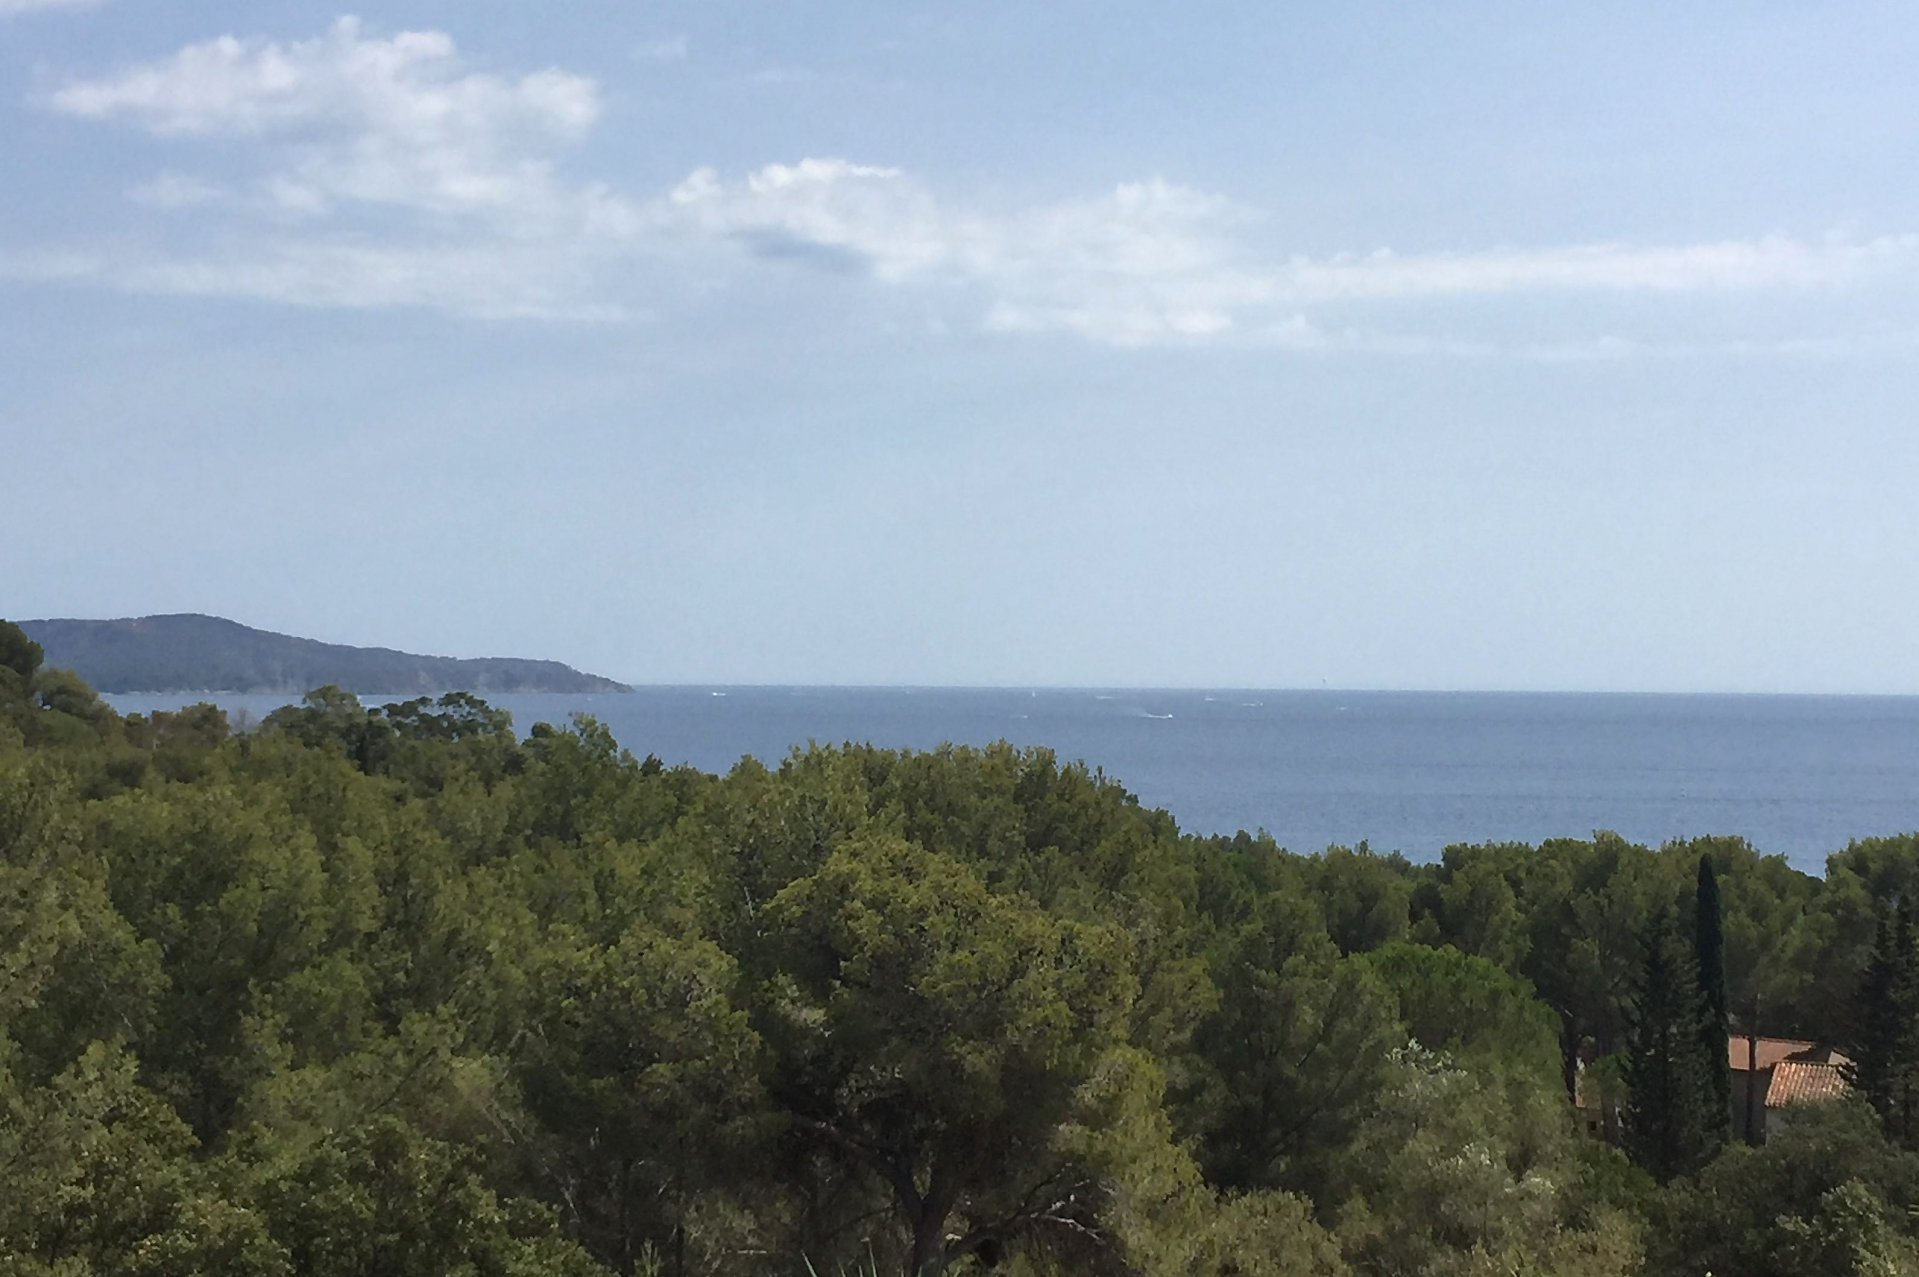 Sea side house Cavalaire sur Mer Var Provence